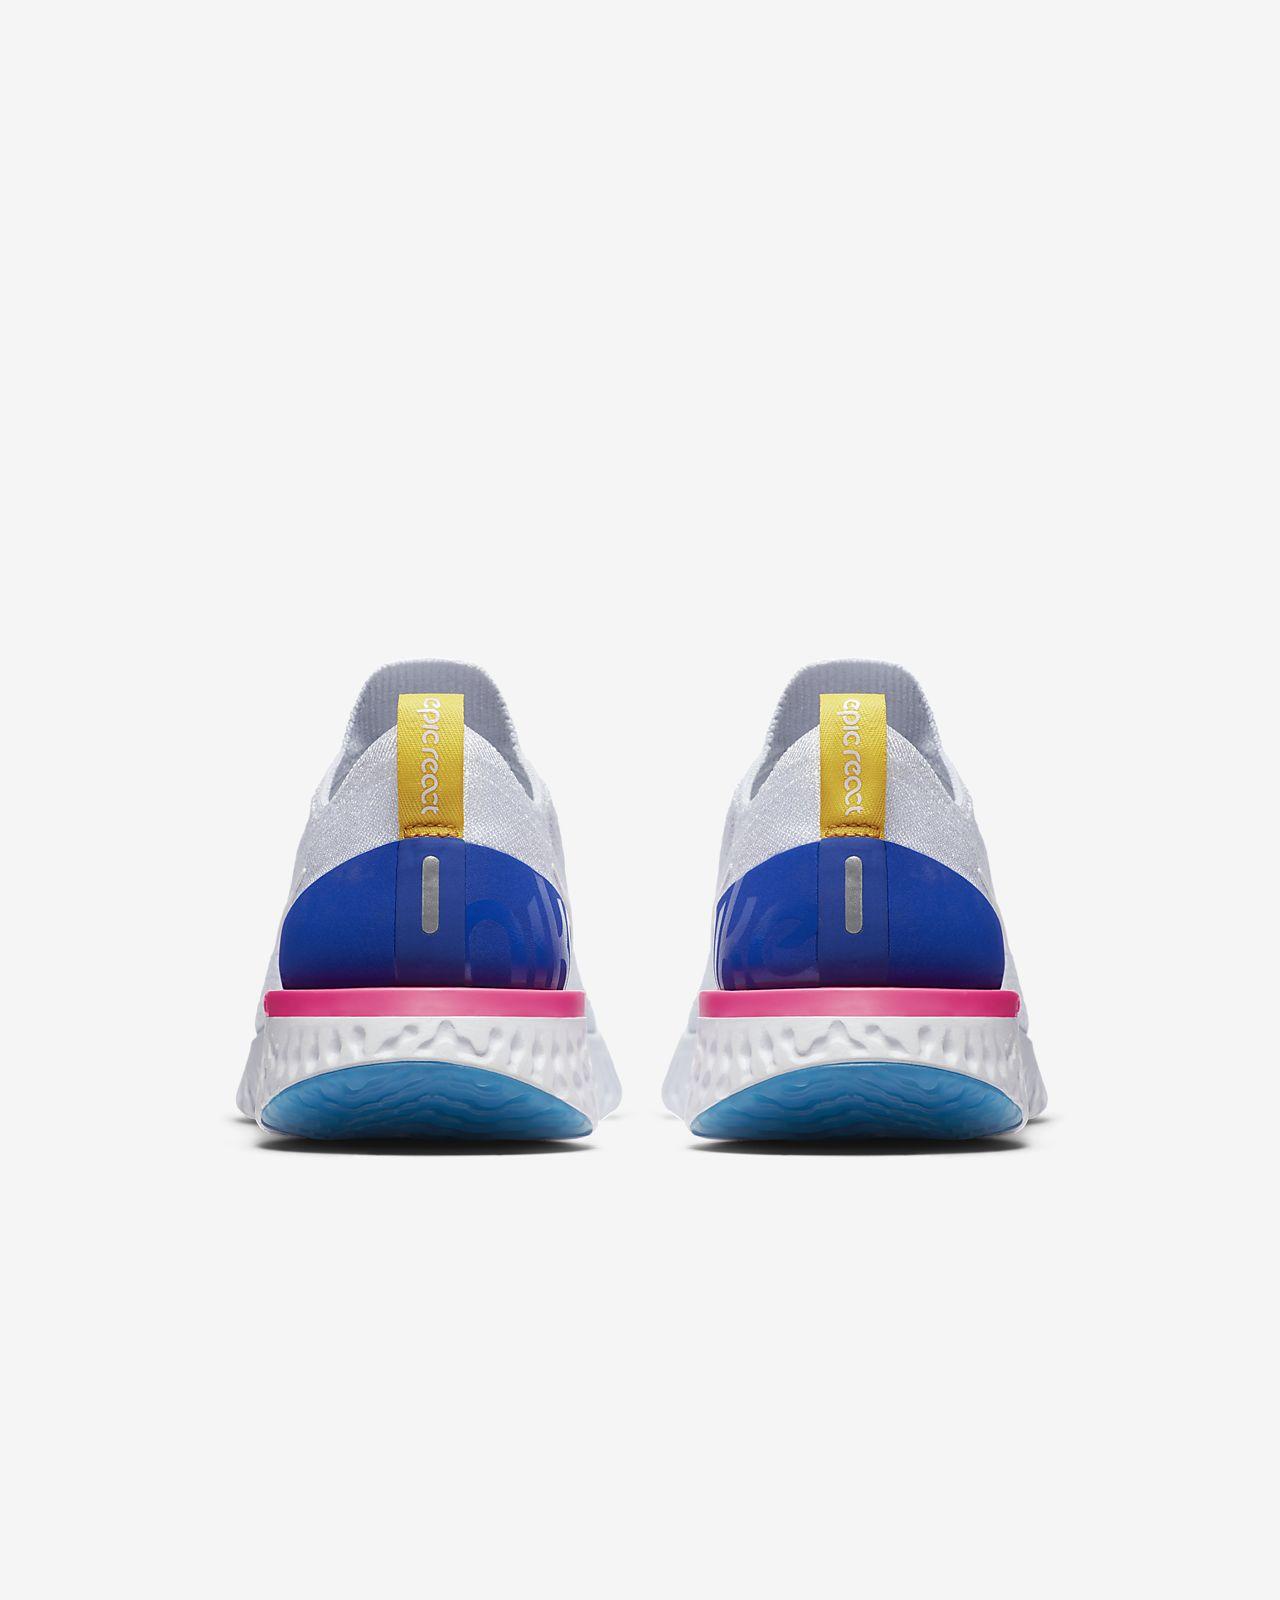 huge selection of 095fd d3a7e australia blå svart sko nike epic react flyknit racer 08b7f 240ae  reduced nike  epic react flyknit womens running shoe c2a2a a52ec